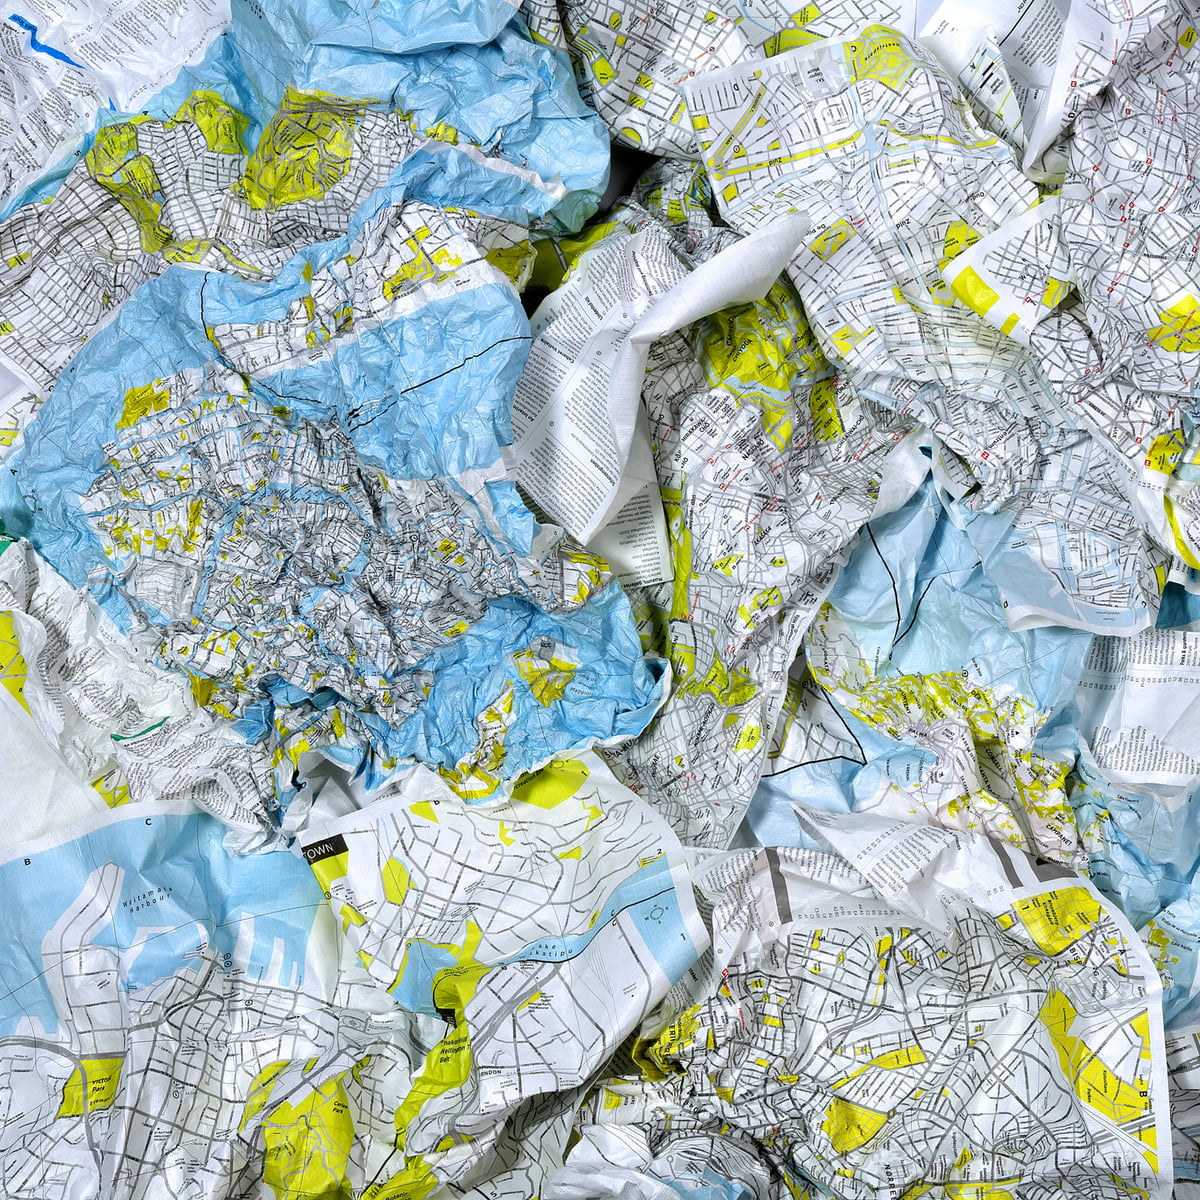 Crumpled City Map by Palomar in the shop on city neighborhood, city intersection, city of potwin kansas, city street, city of austin etj, topographic map, city restaurants, locator map, city of arcadia fl, fantasy map, city of sandpoint idaho, city of lake village arkansas, city of audubon iowa, street map, city drawing, city of newburgh ny, city of galva il, city of oregon wisconsin, road atlas, city of alexandria louisiana, reversed map, world map, city planning, pictorial maps, city of hamilton michigan, city diagram, city of milan ga, city road, thematic map,